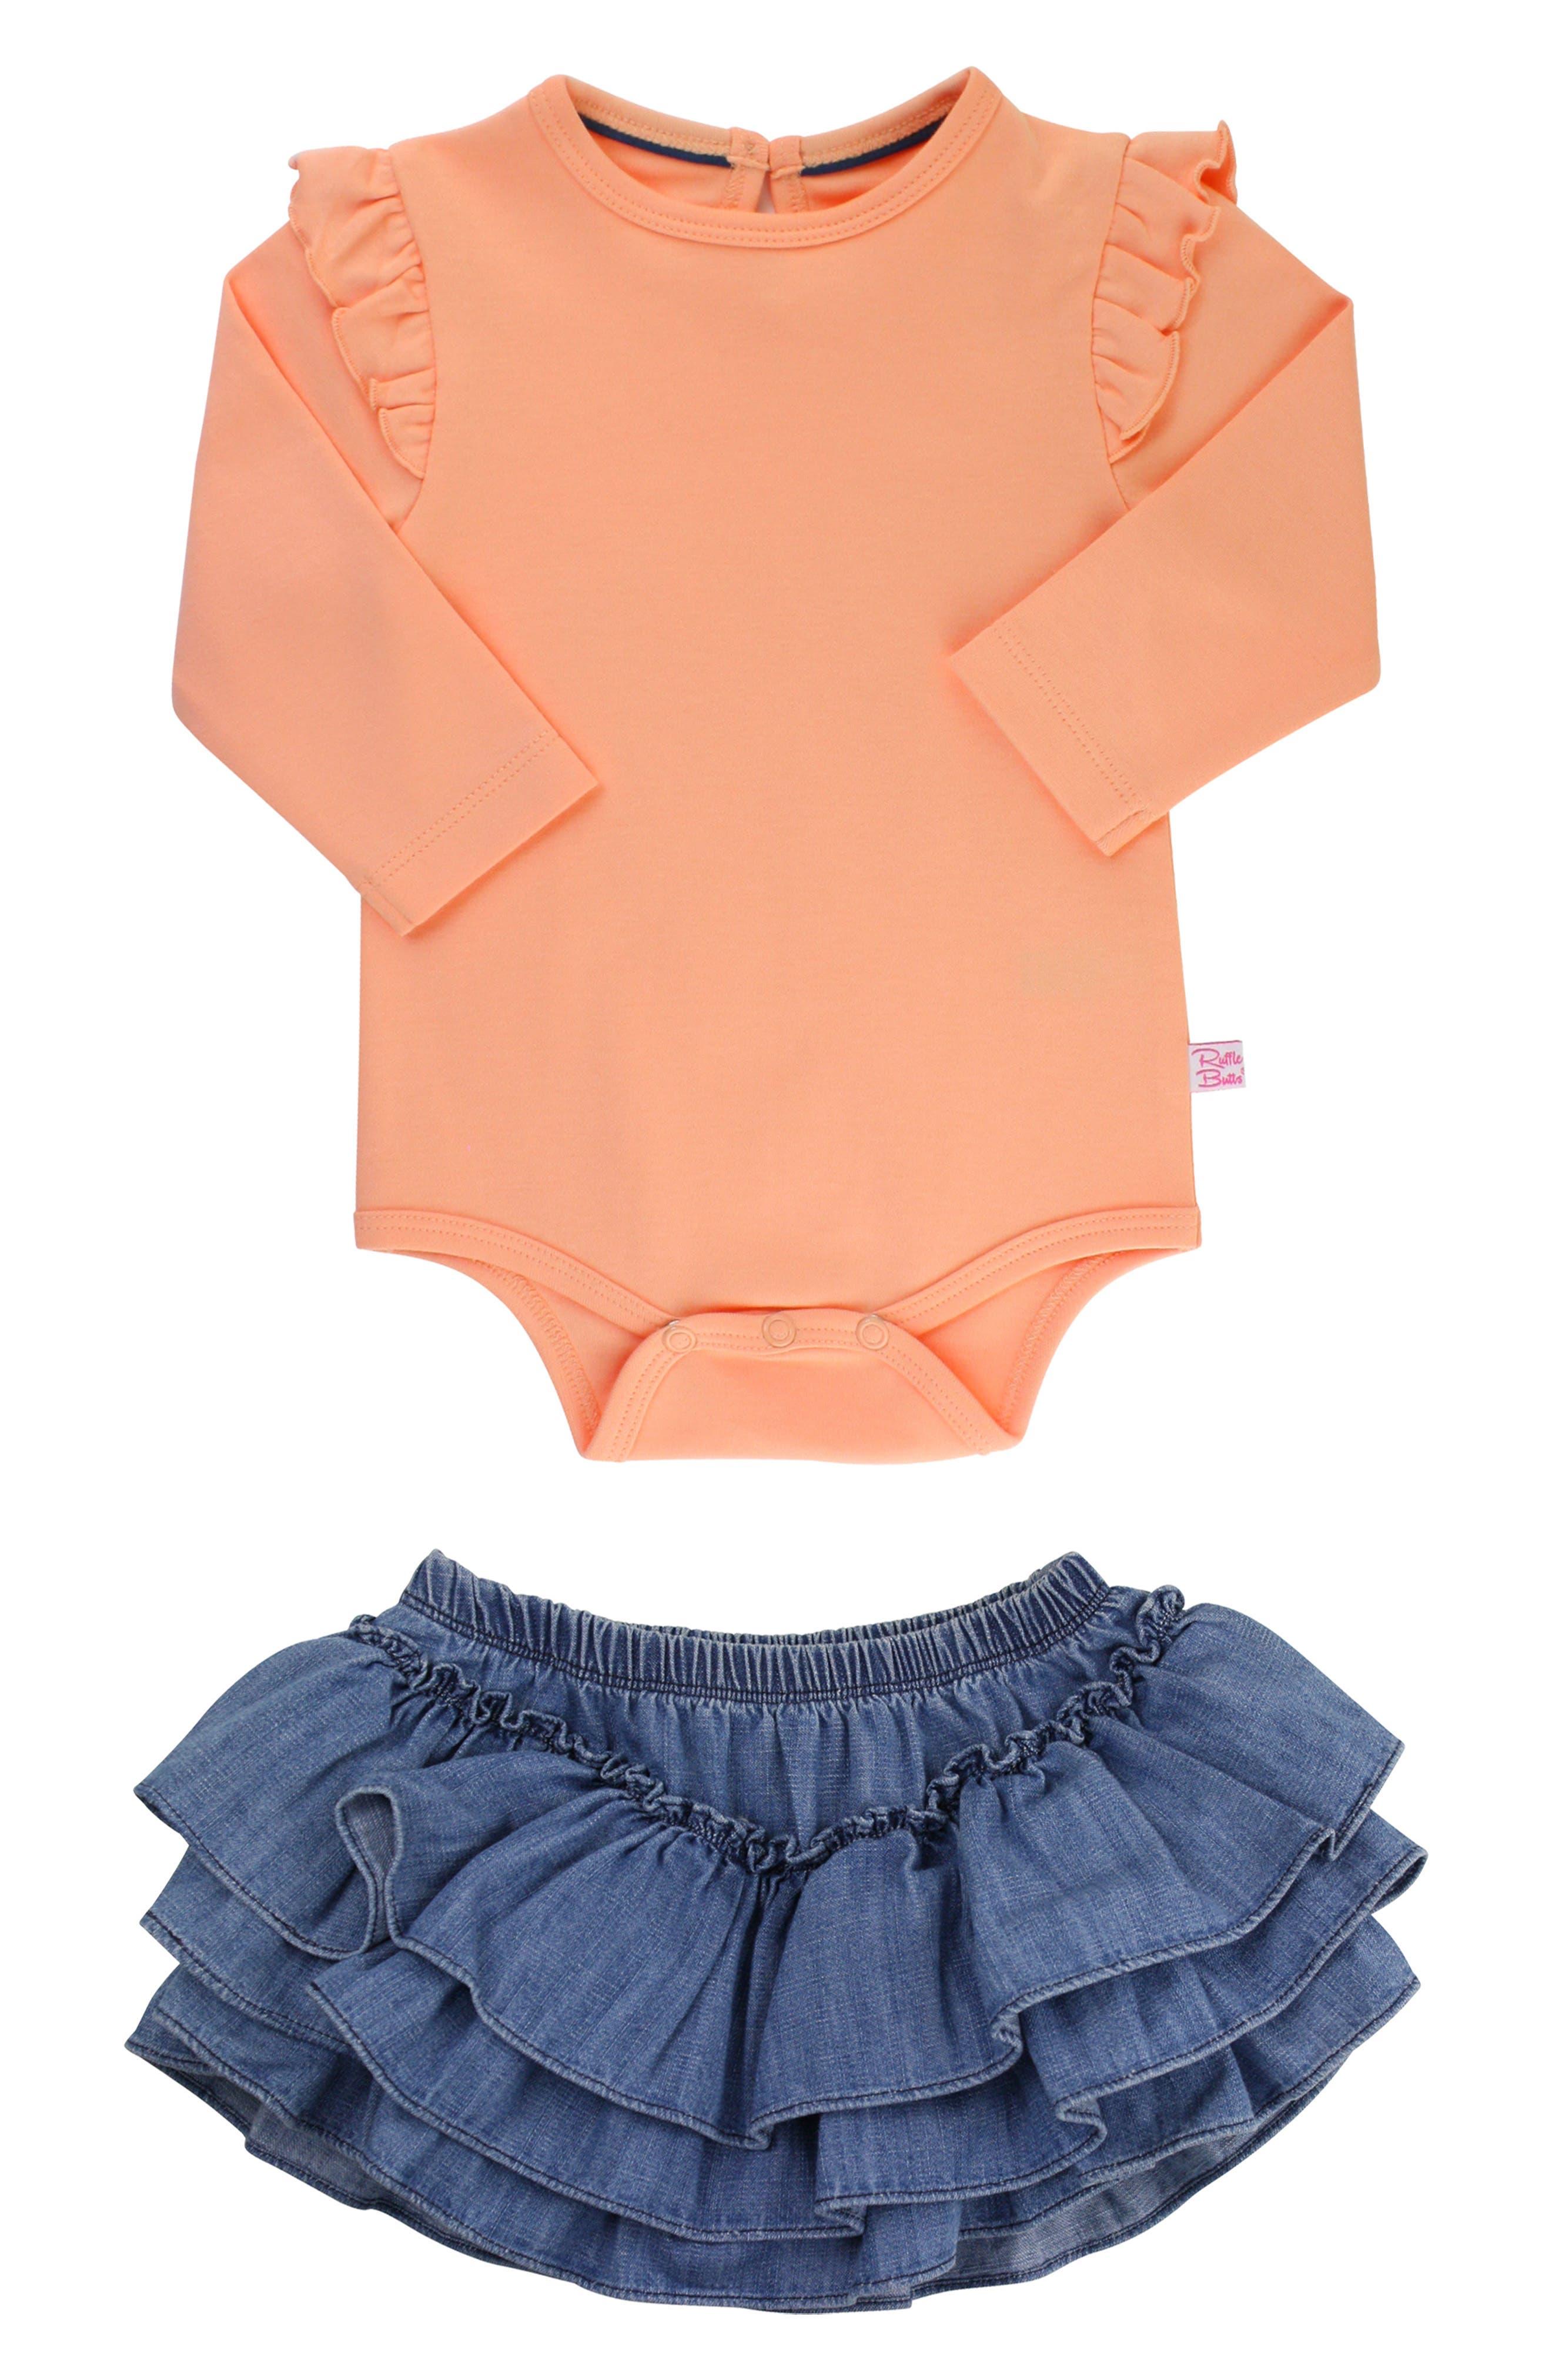 Apricot Bodysuit & Skirted Bloomers Set,                             Main thumbnail 1, color,                             DENIM